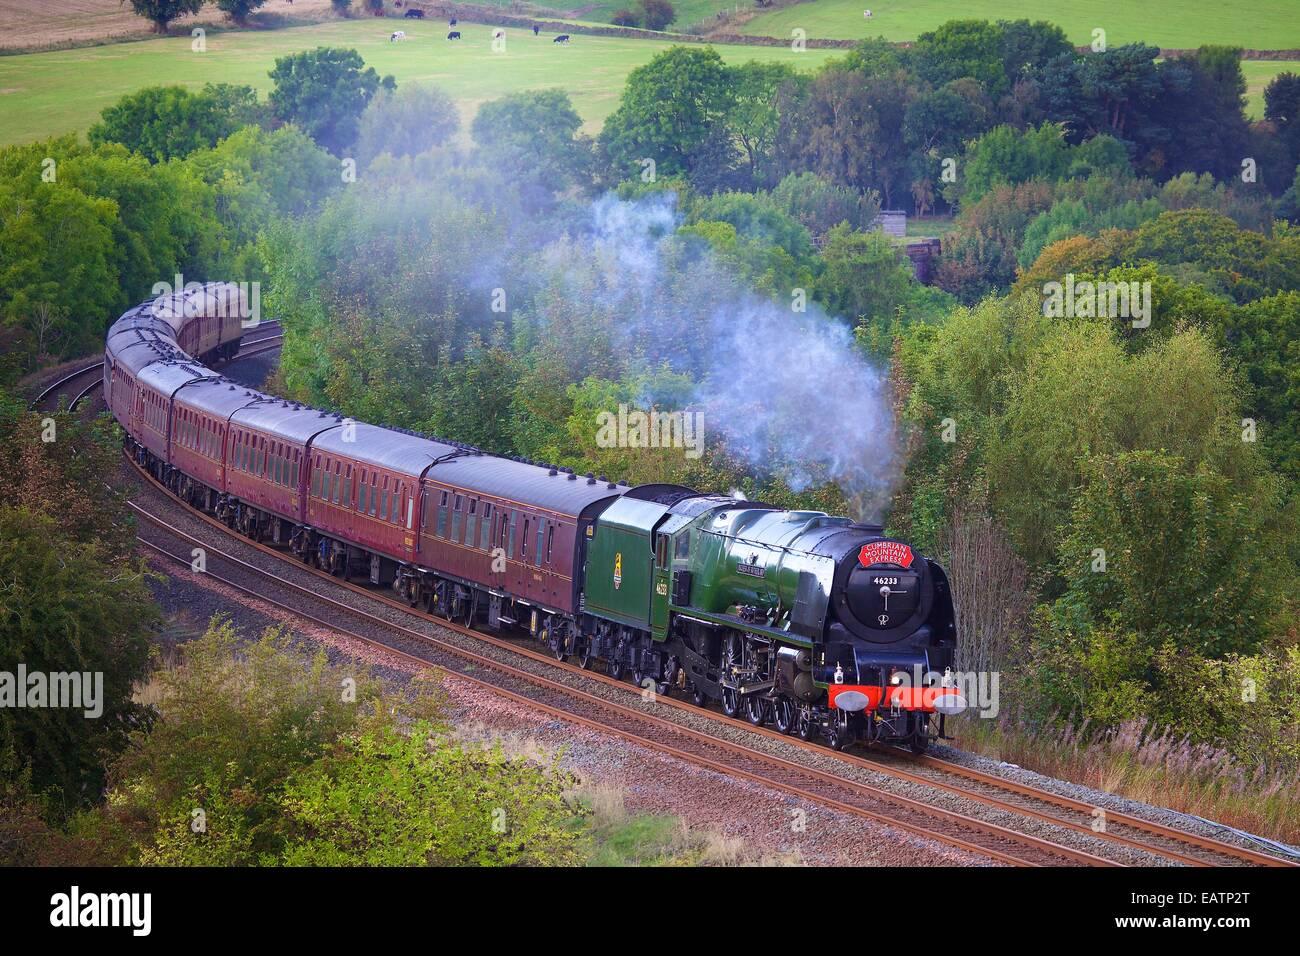 Steam locomotive Duchess of Sutherland near Low Baron Wood Farm Armathwaite Eden Valley, Cumbria, England, UK. - Stock Image